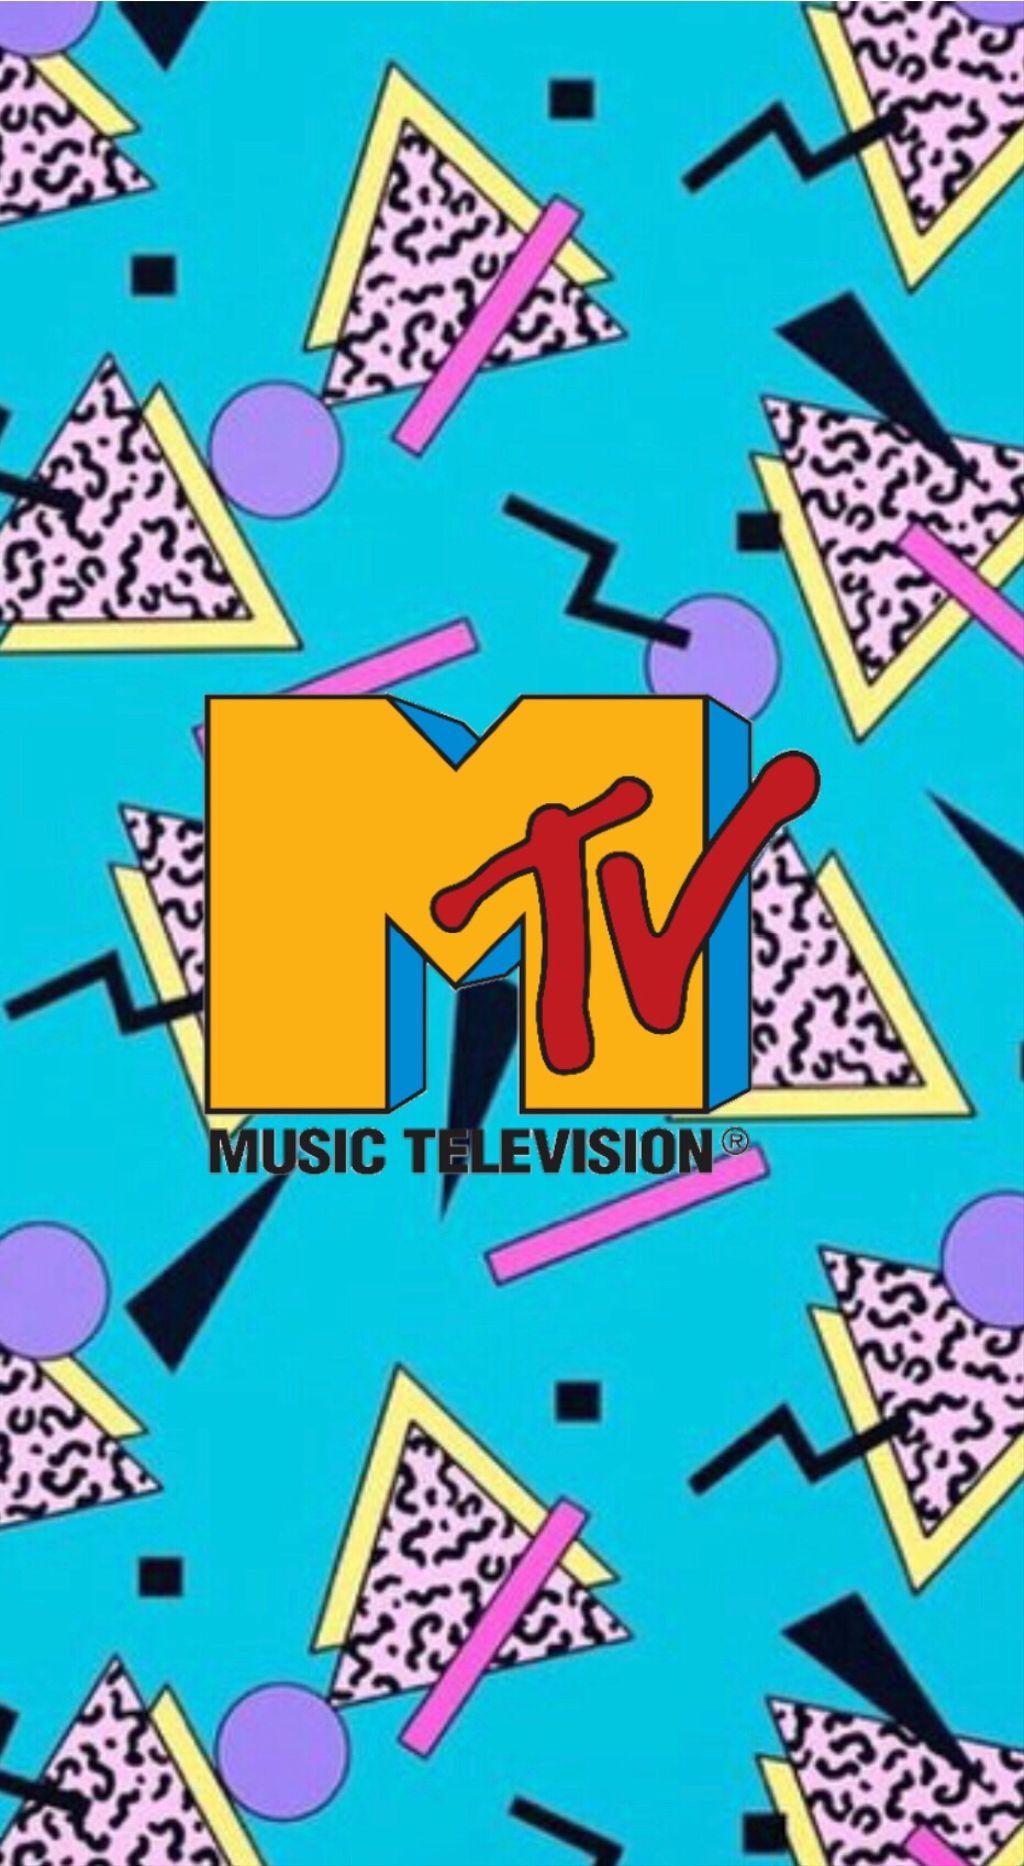 mtvmusic music mtv 80s aesthetic aesthetics tumblr stic 80s 1024x1866